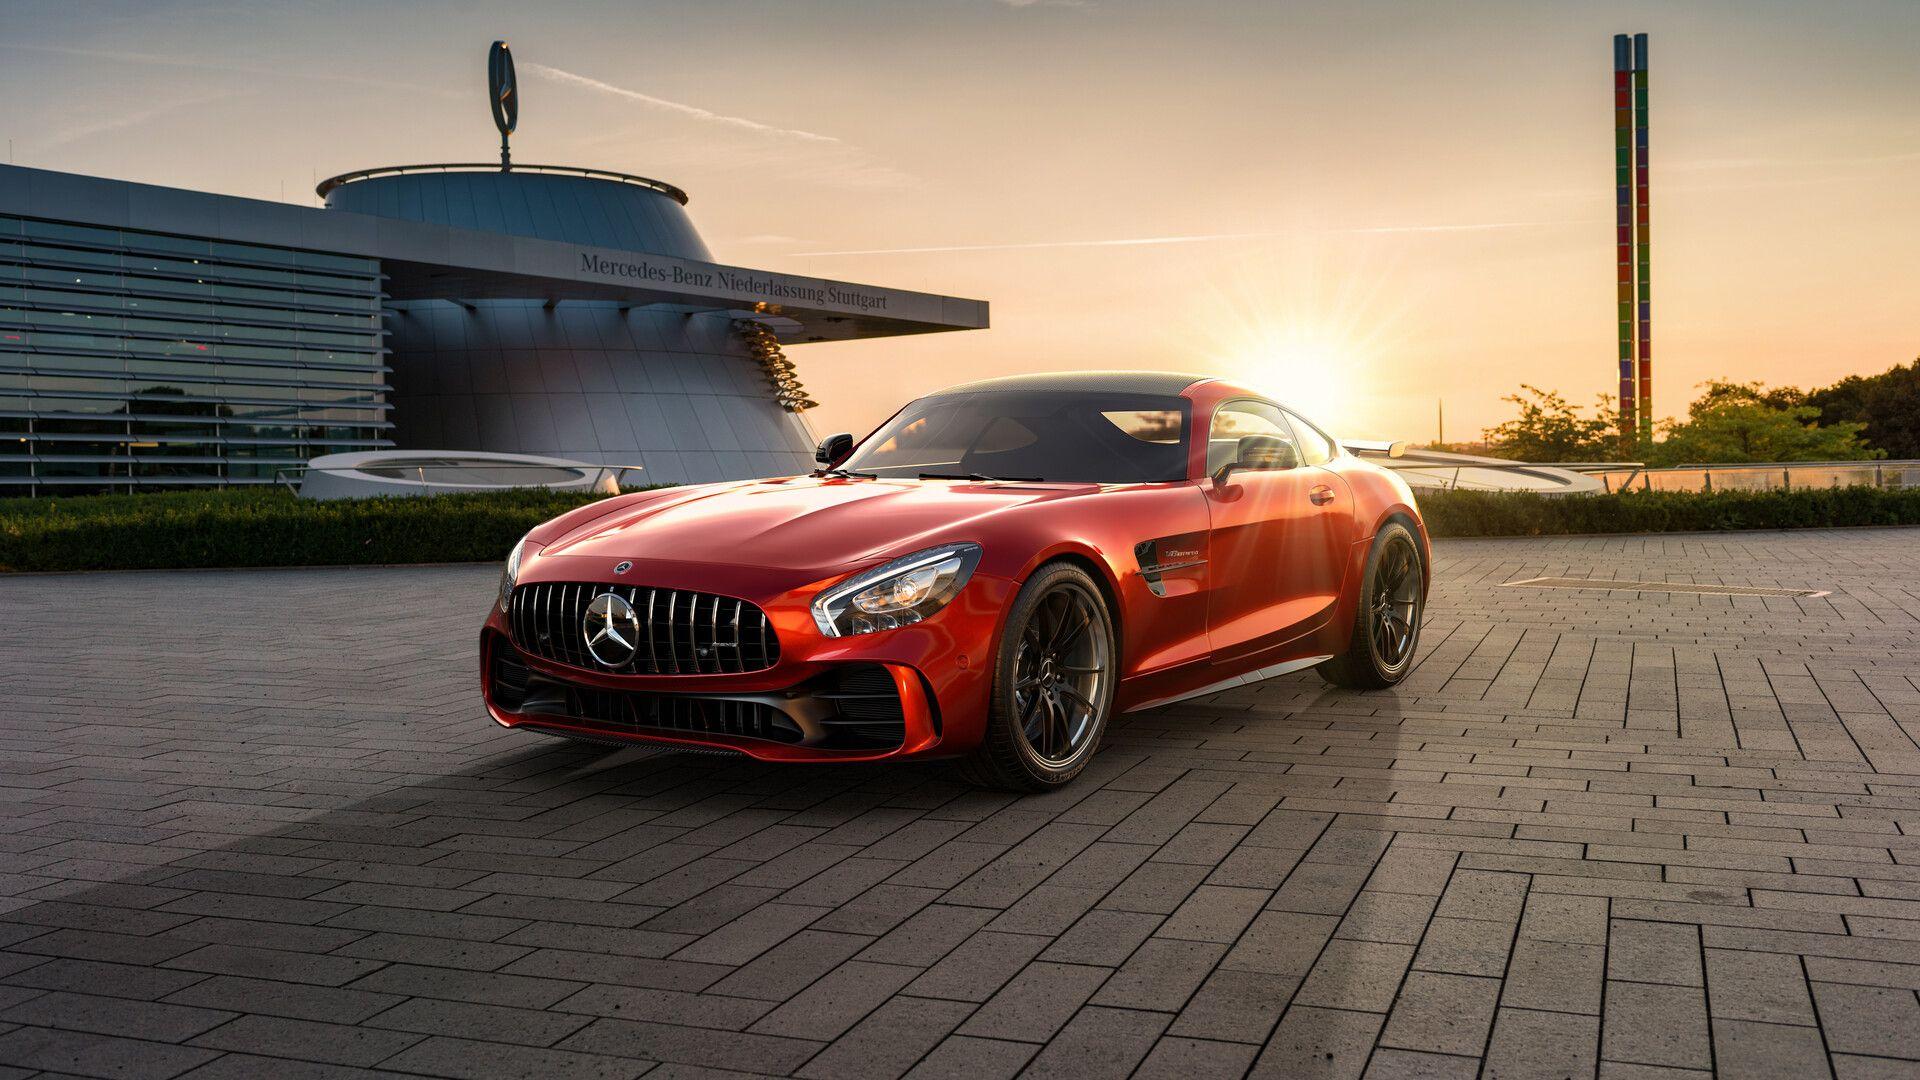 Am Gtr Cgi By Ahmed Anas Mercedes Amg Mercedes Benz Convertible Mercedes Benz Sedan